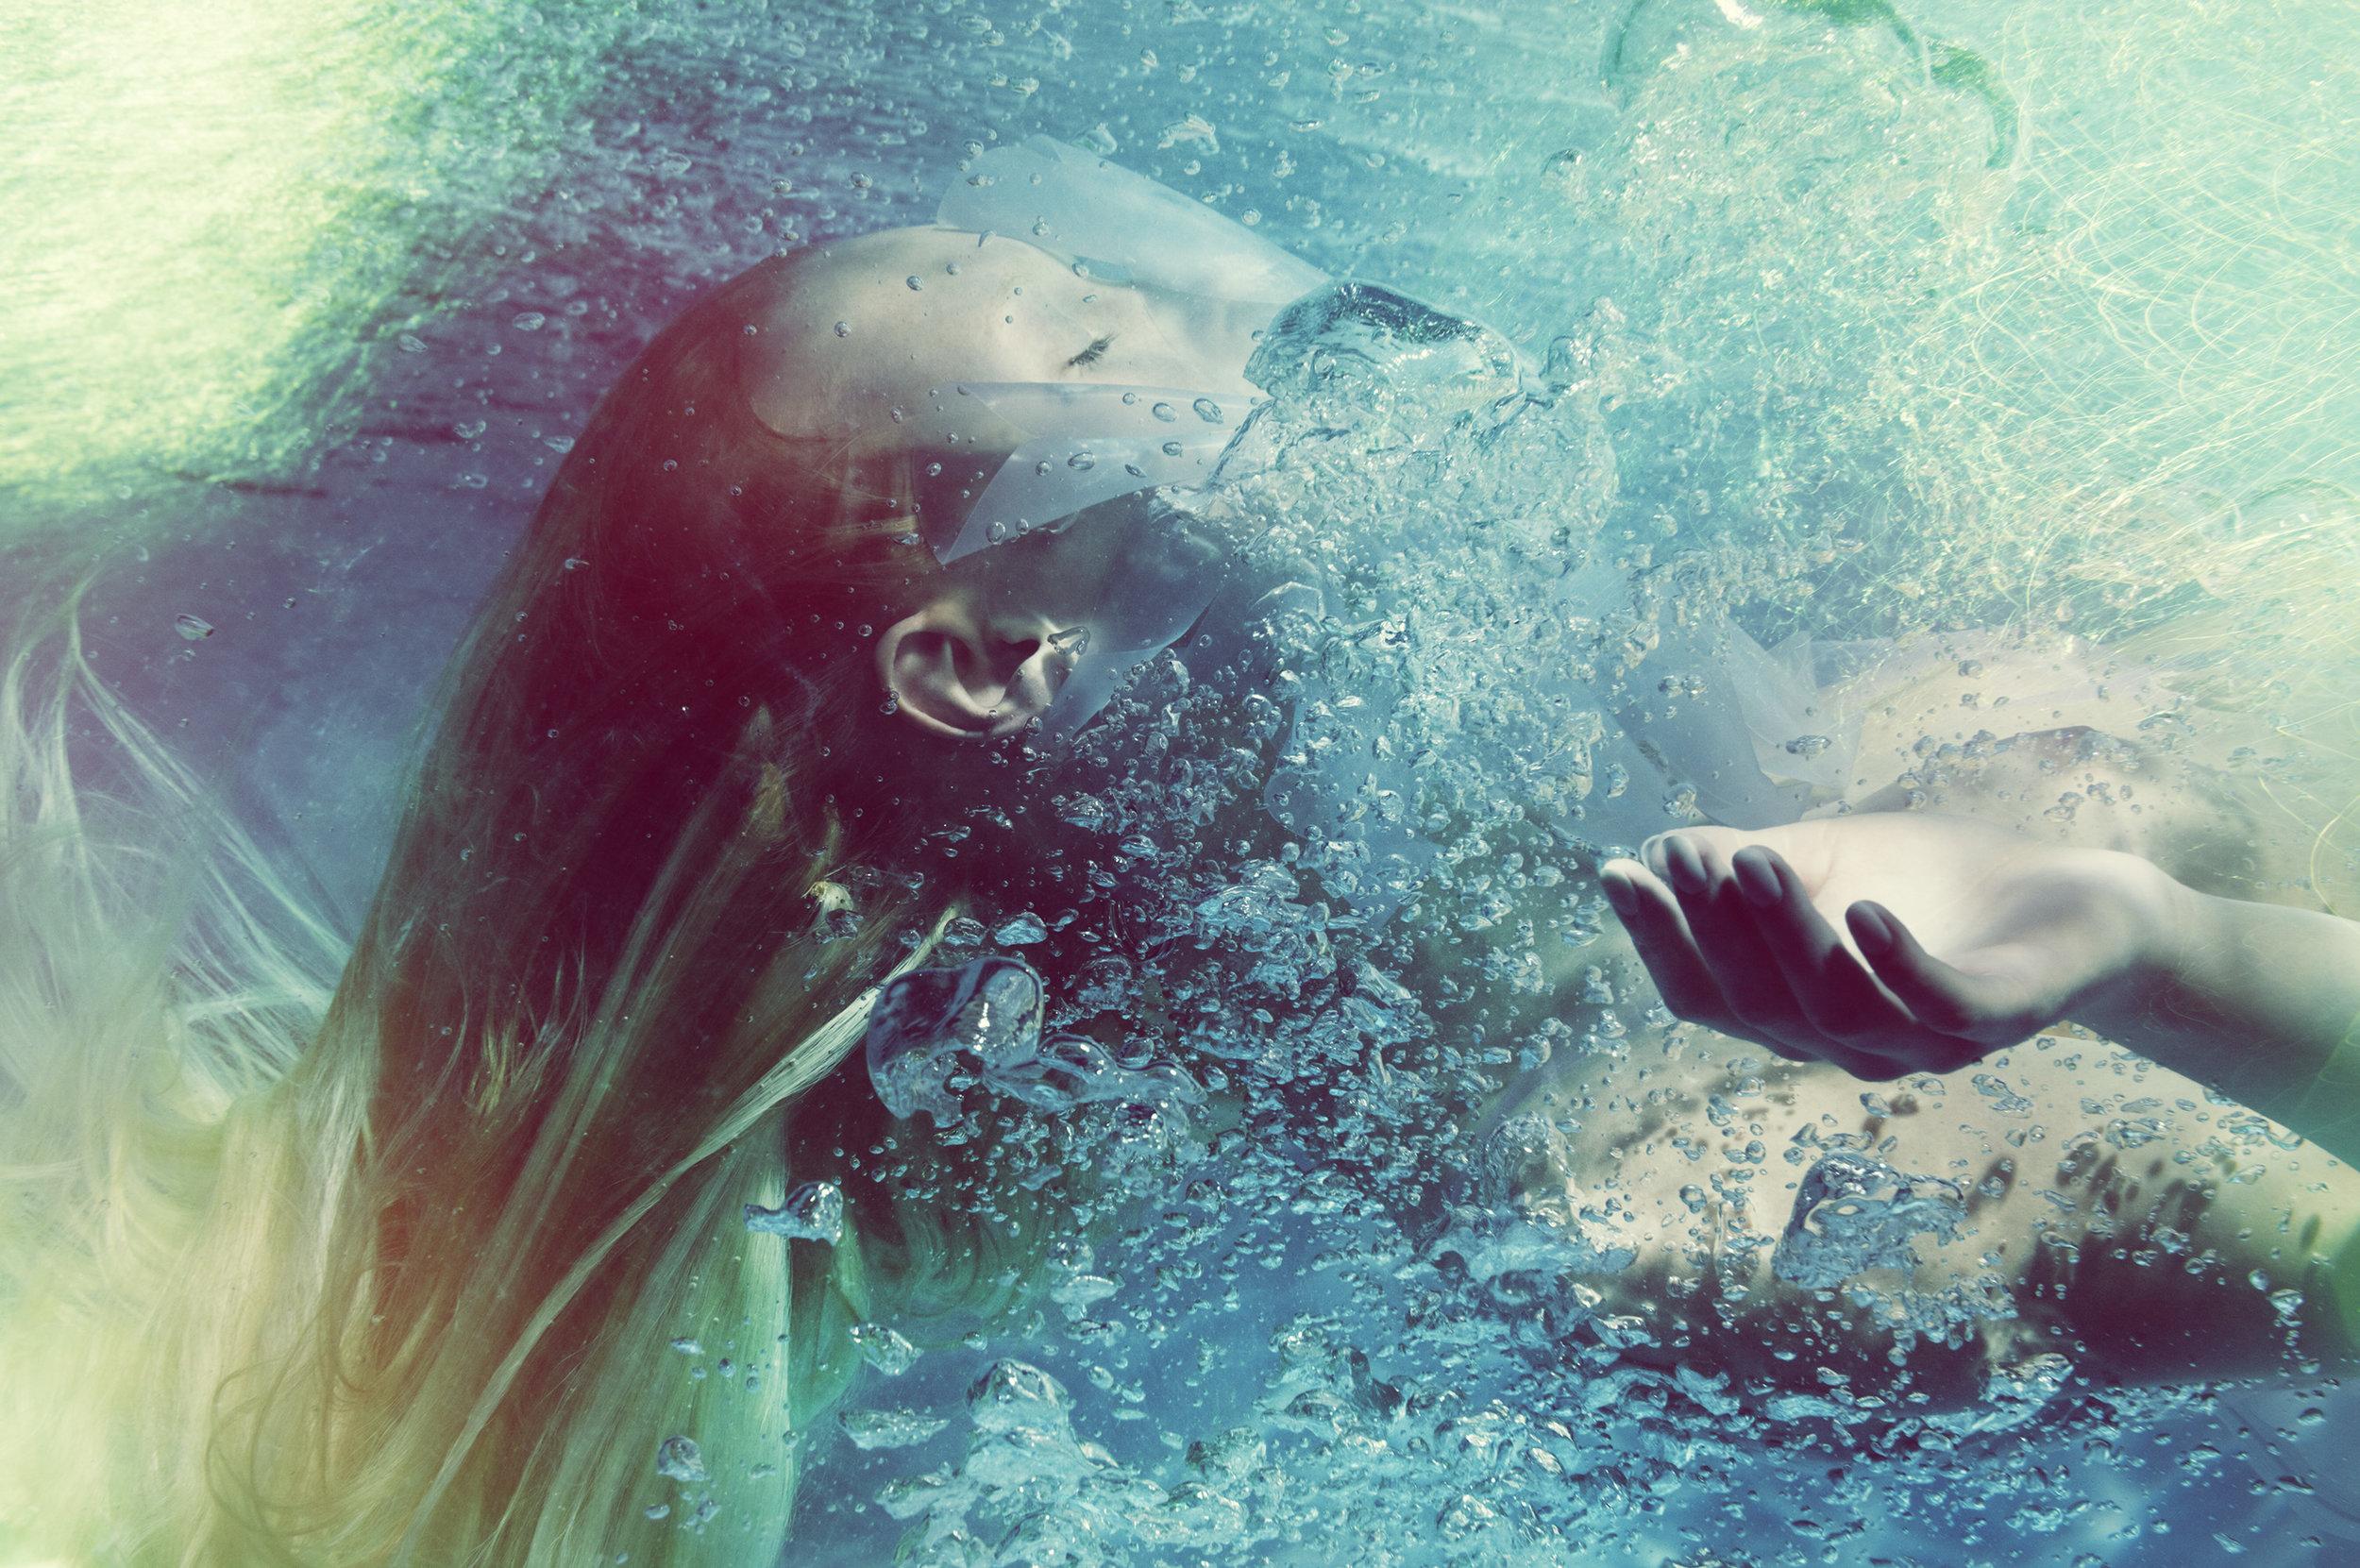 Susanne Stemmer girl under surface of water